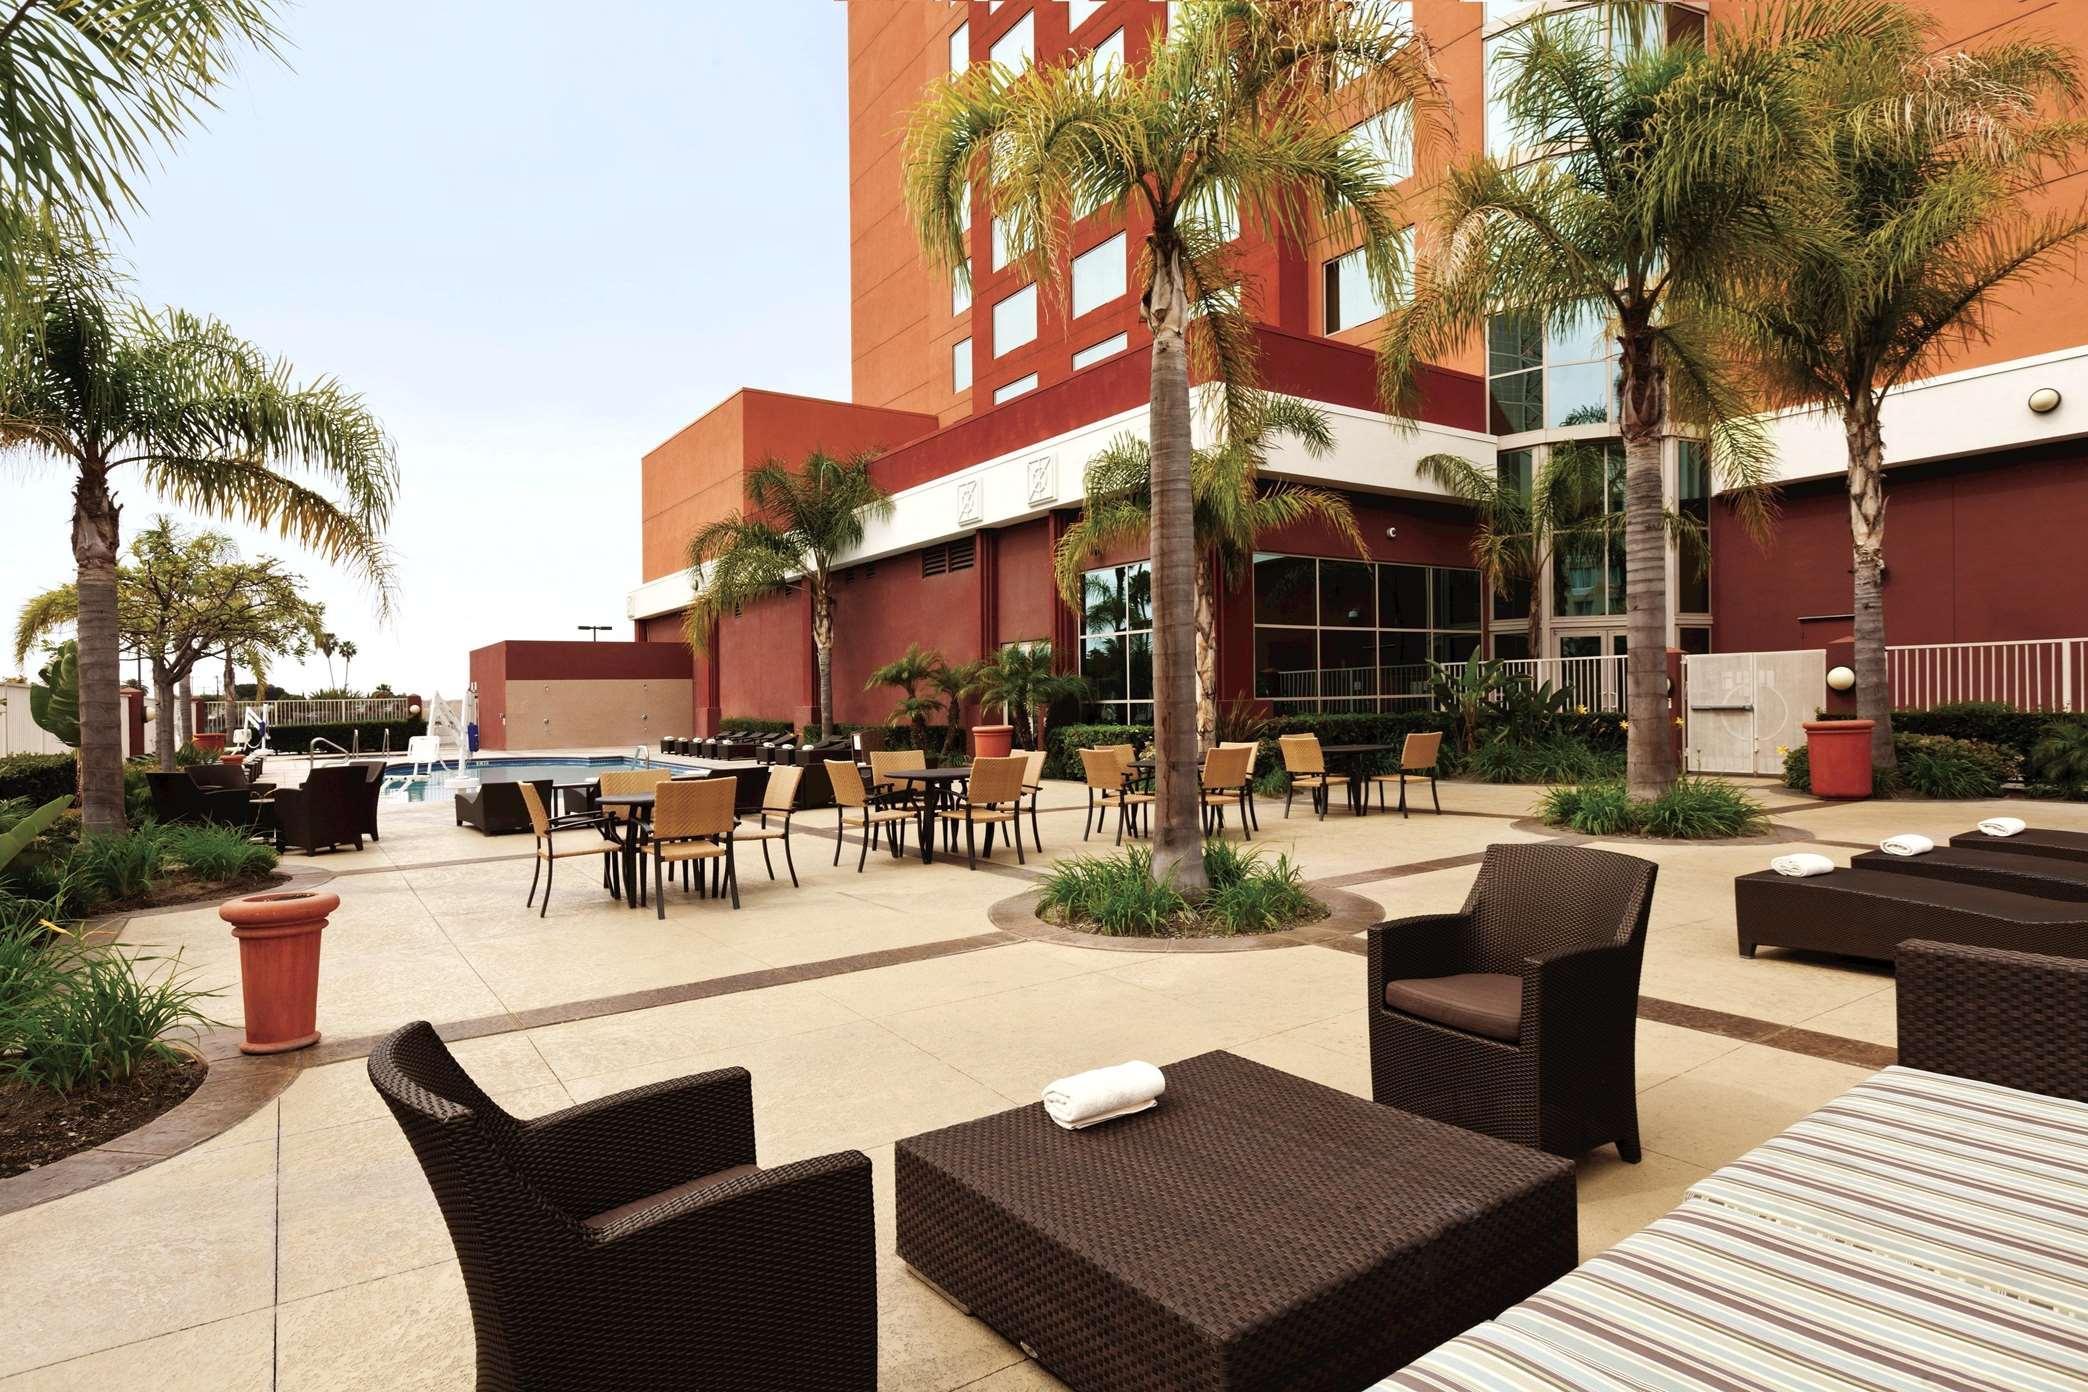 Embassy Suites By Hilton Anaheim South Garden Grove California Ca